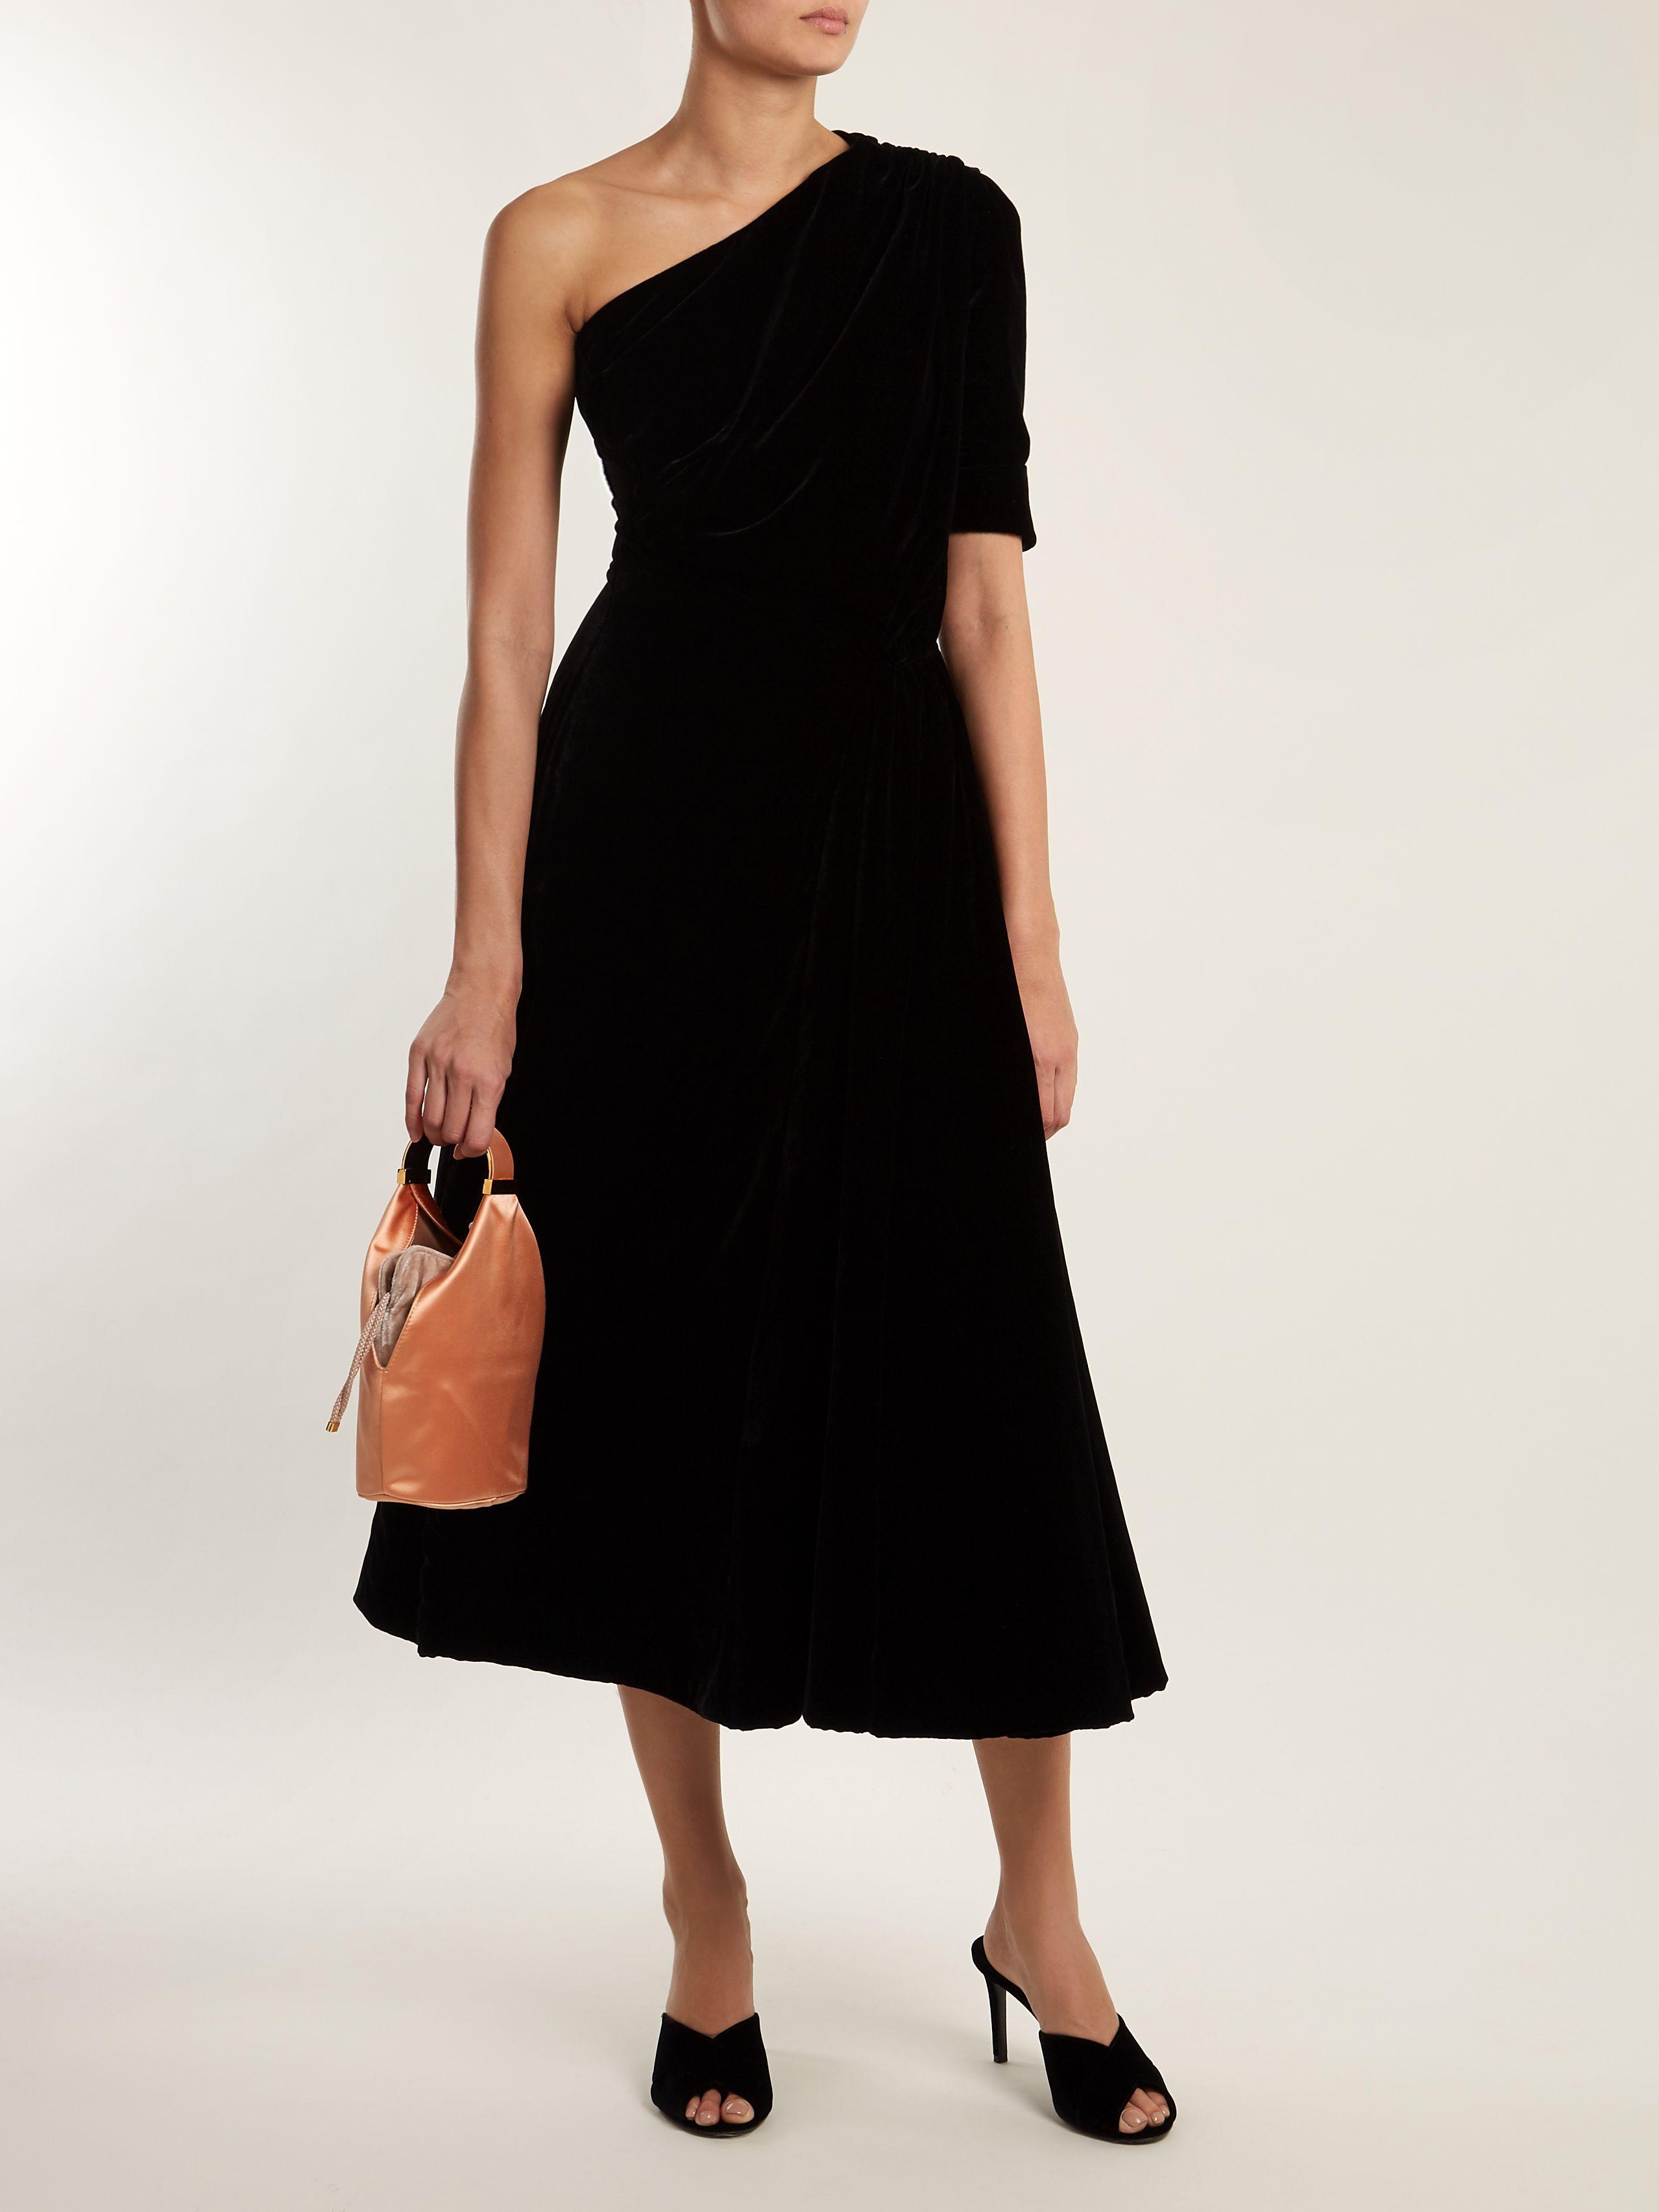 Extremely Release Dates For Sale Jenna one-shoulder velvet midi dress Emilia Wickstead Sale Low Price jerHXQ